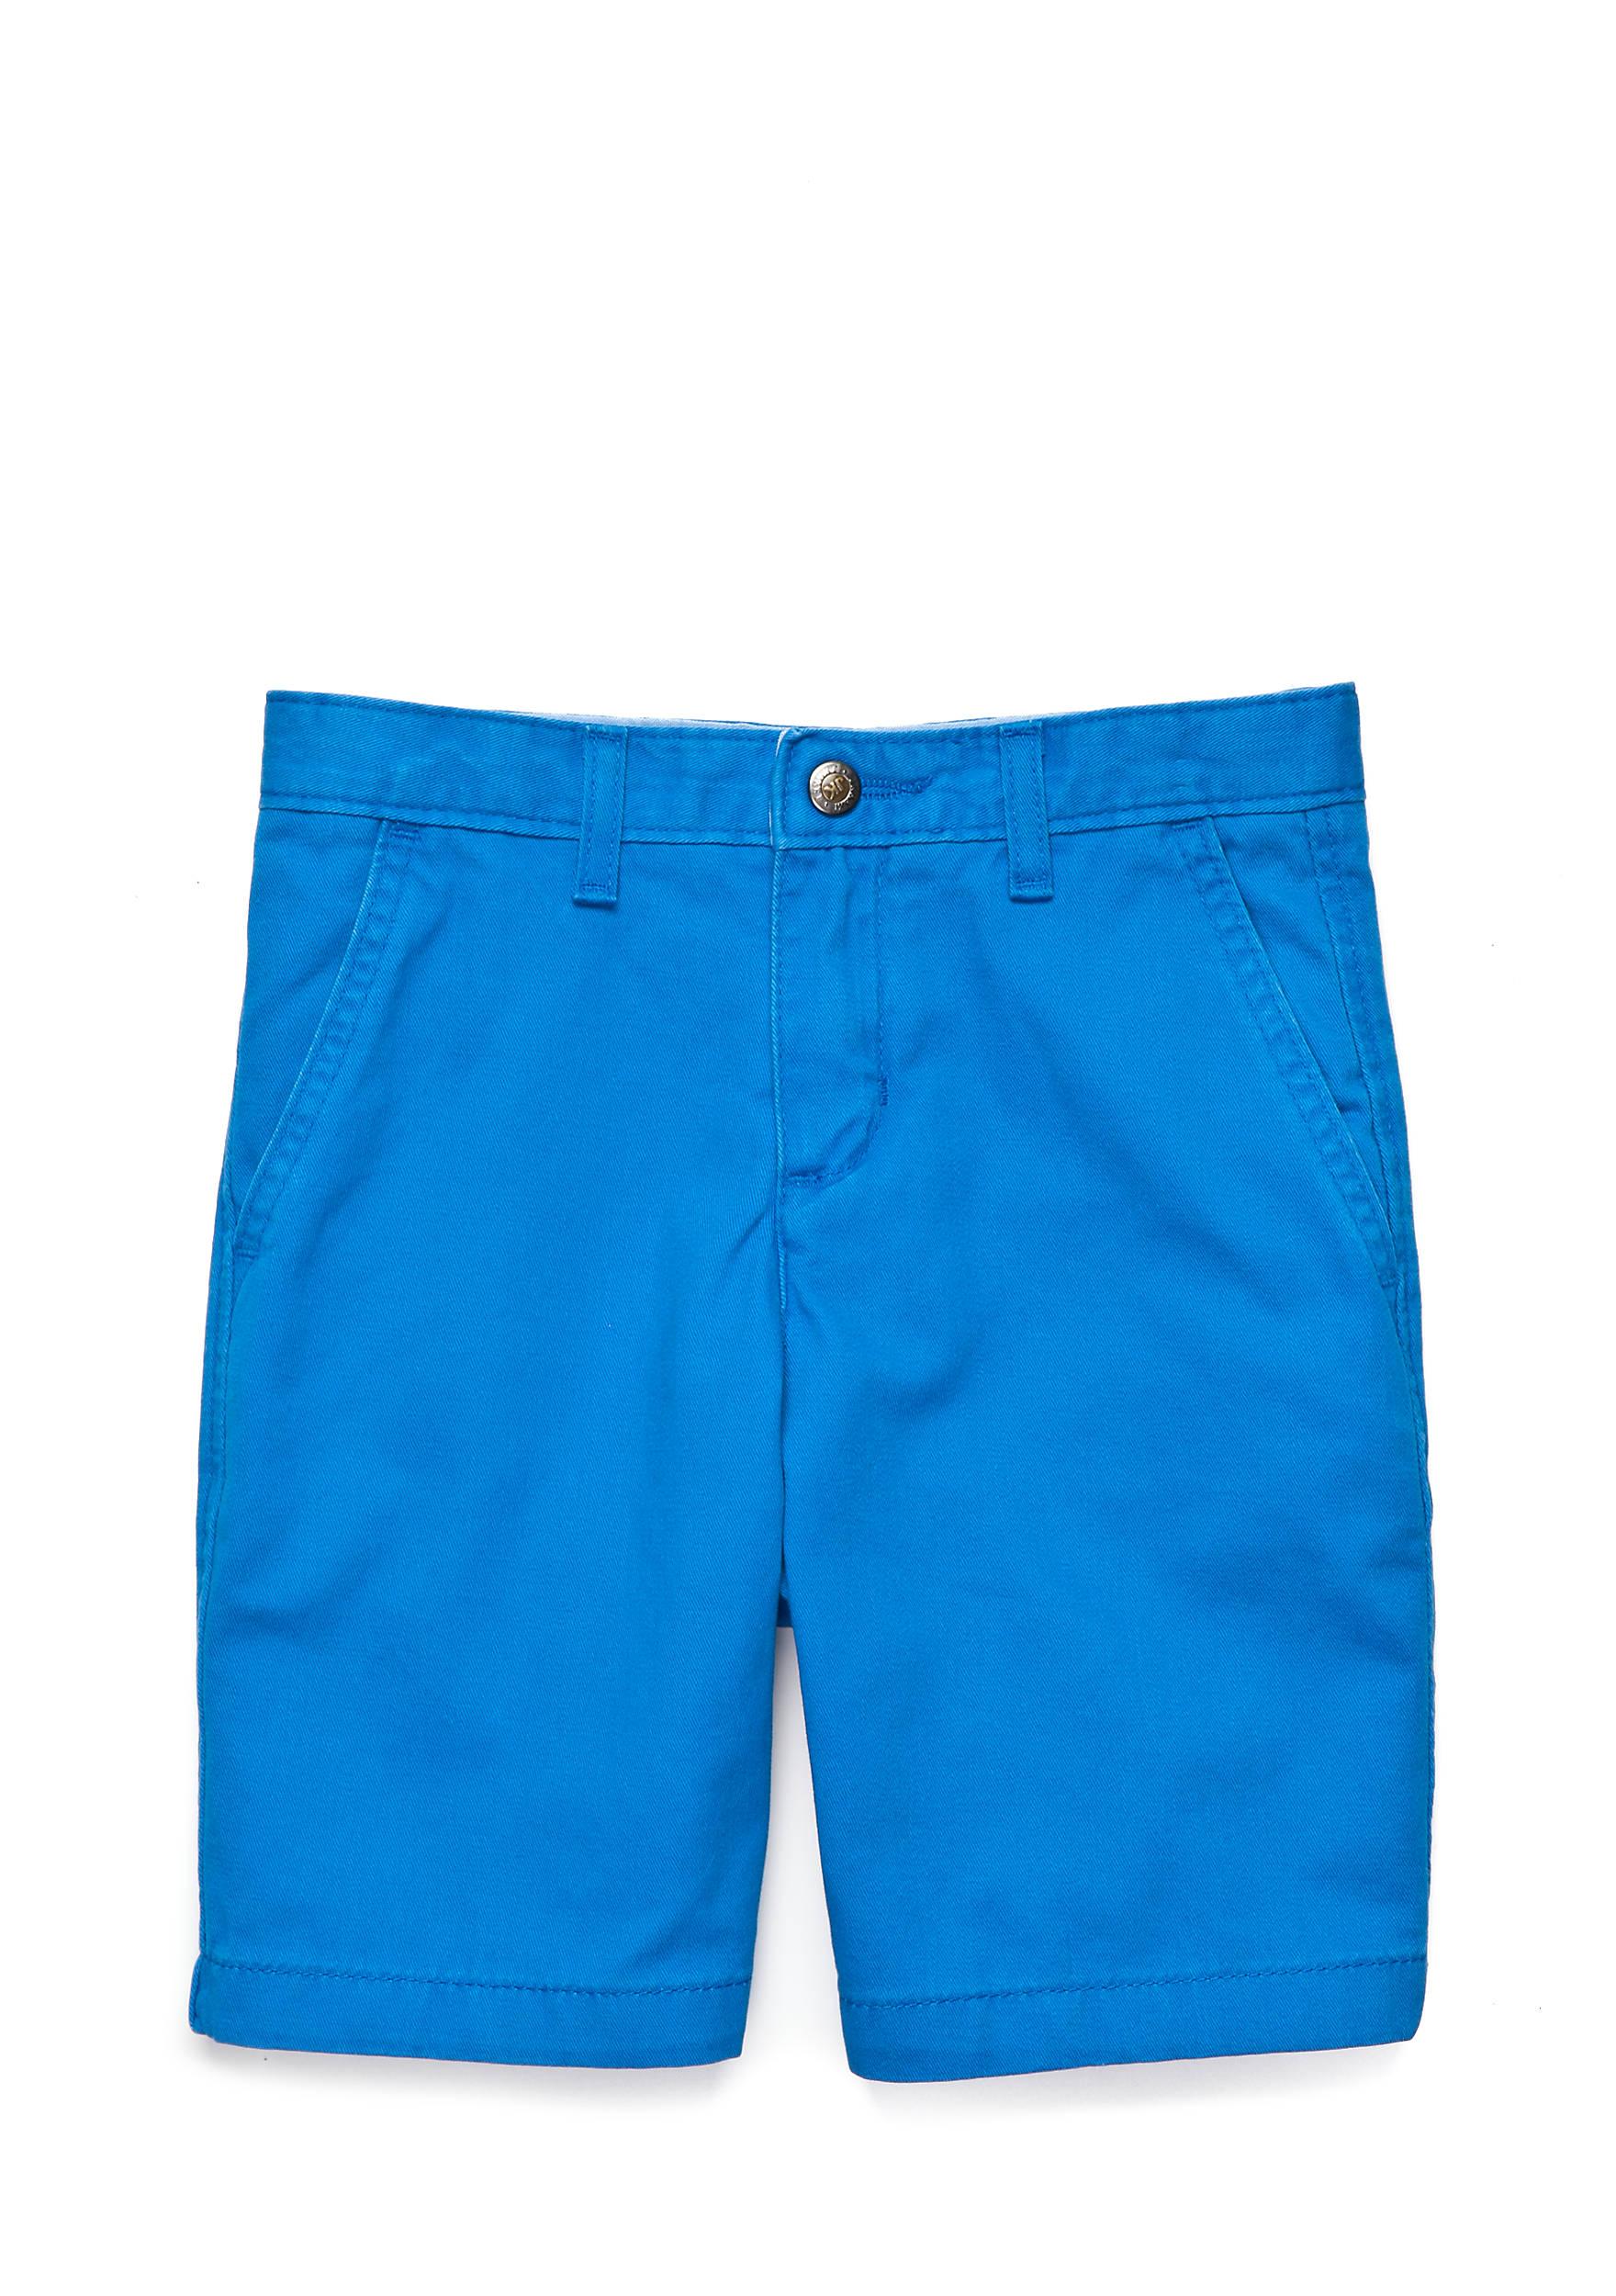 J. Khaki® J Khaki Shorts Boys 4-7 | belk